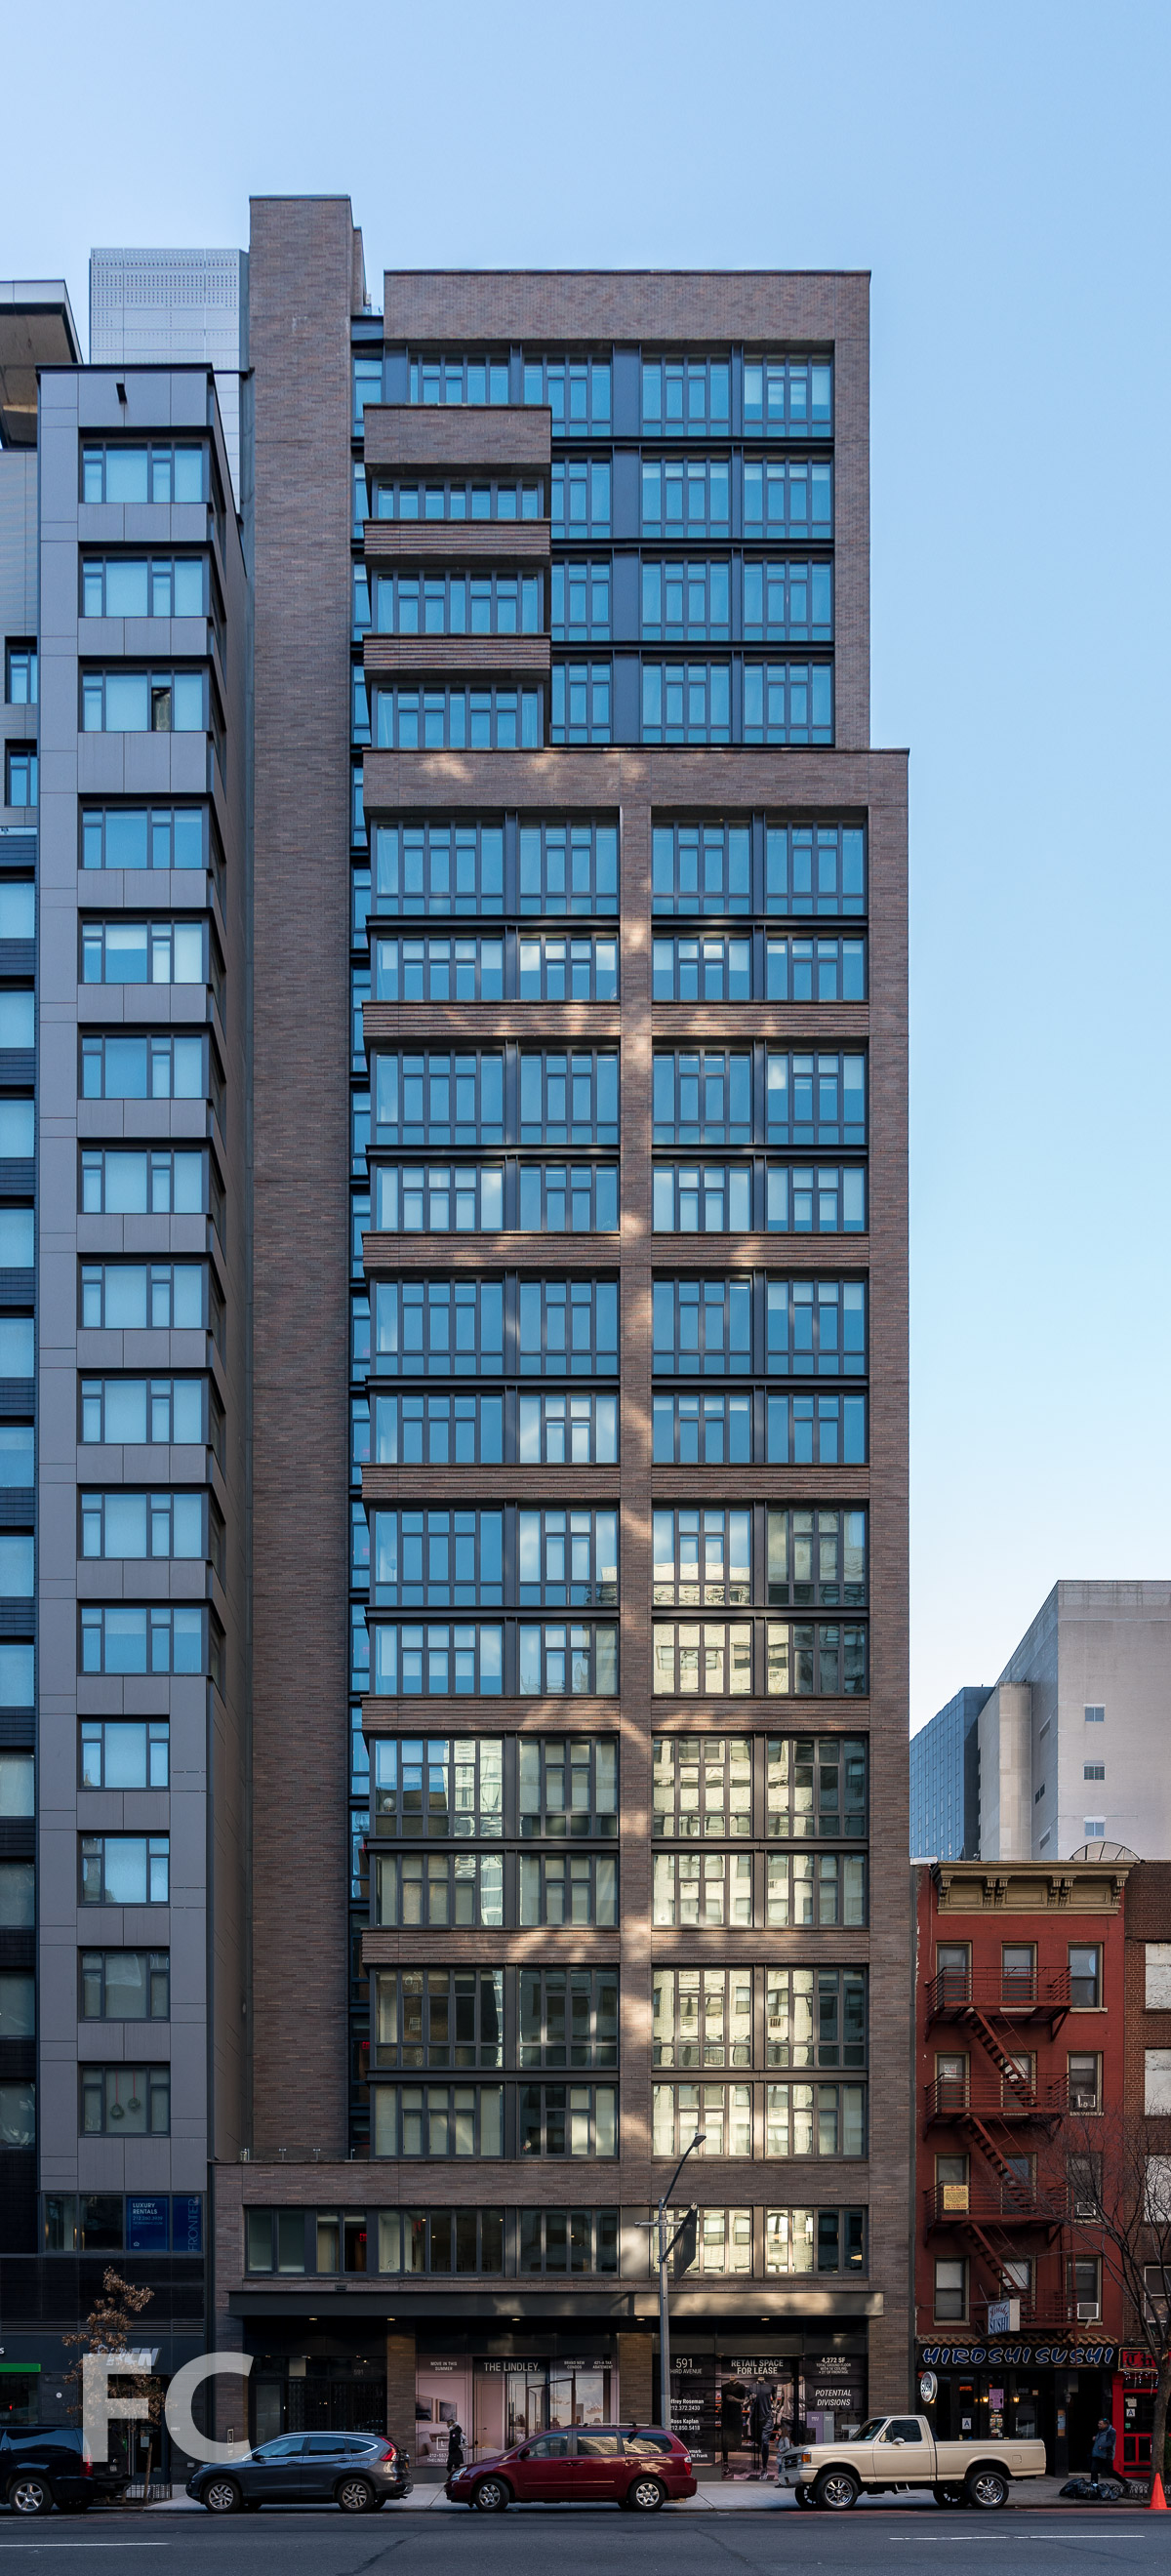 West facade.